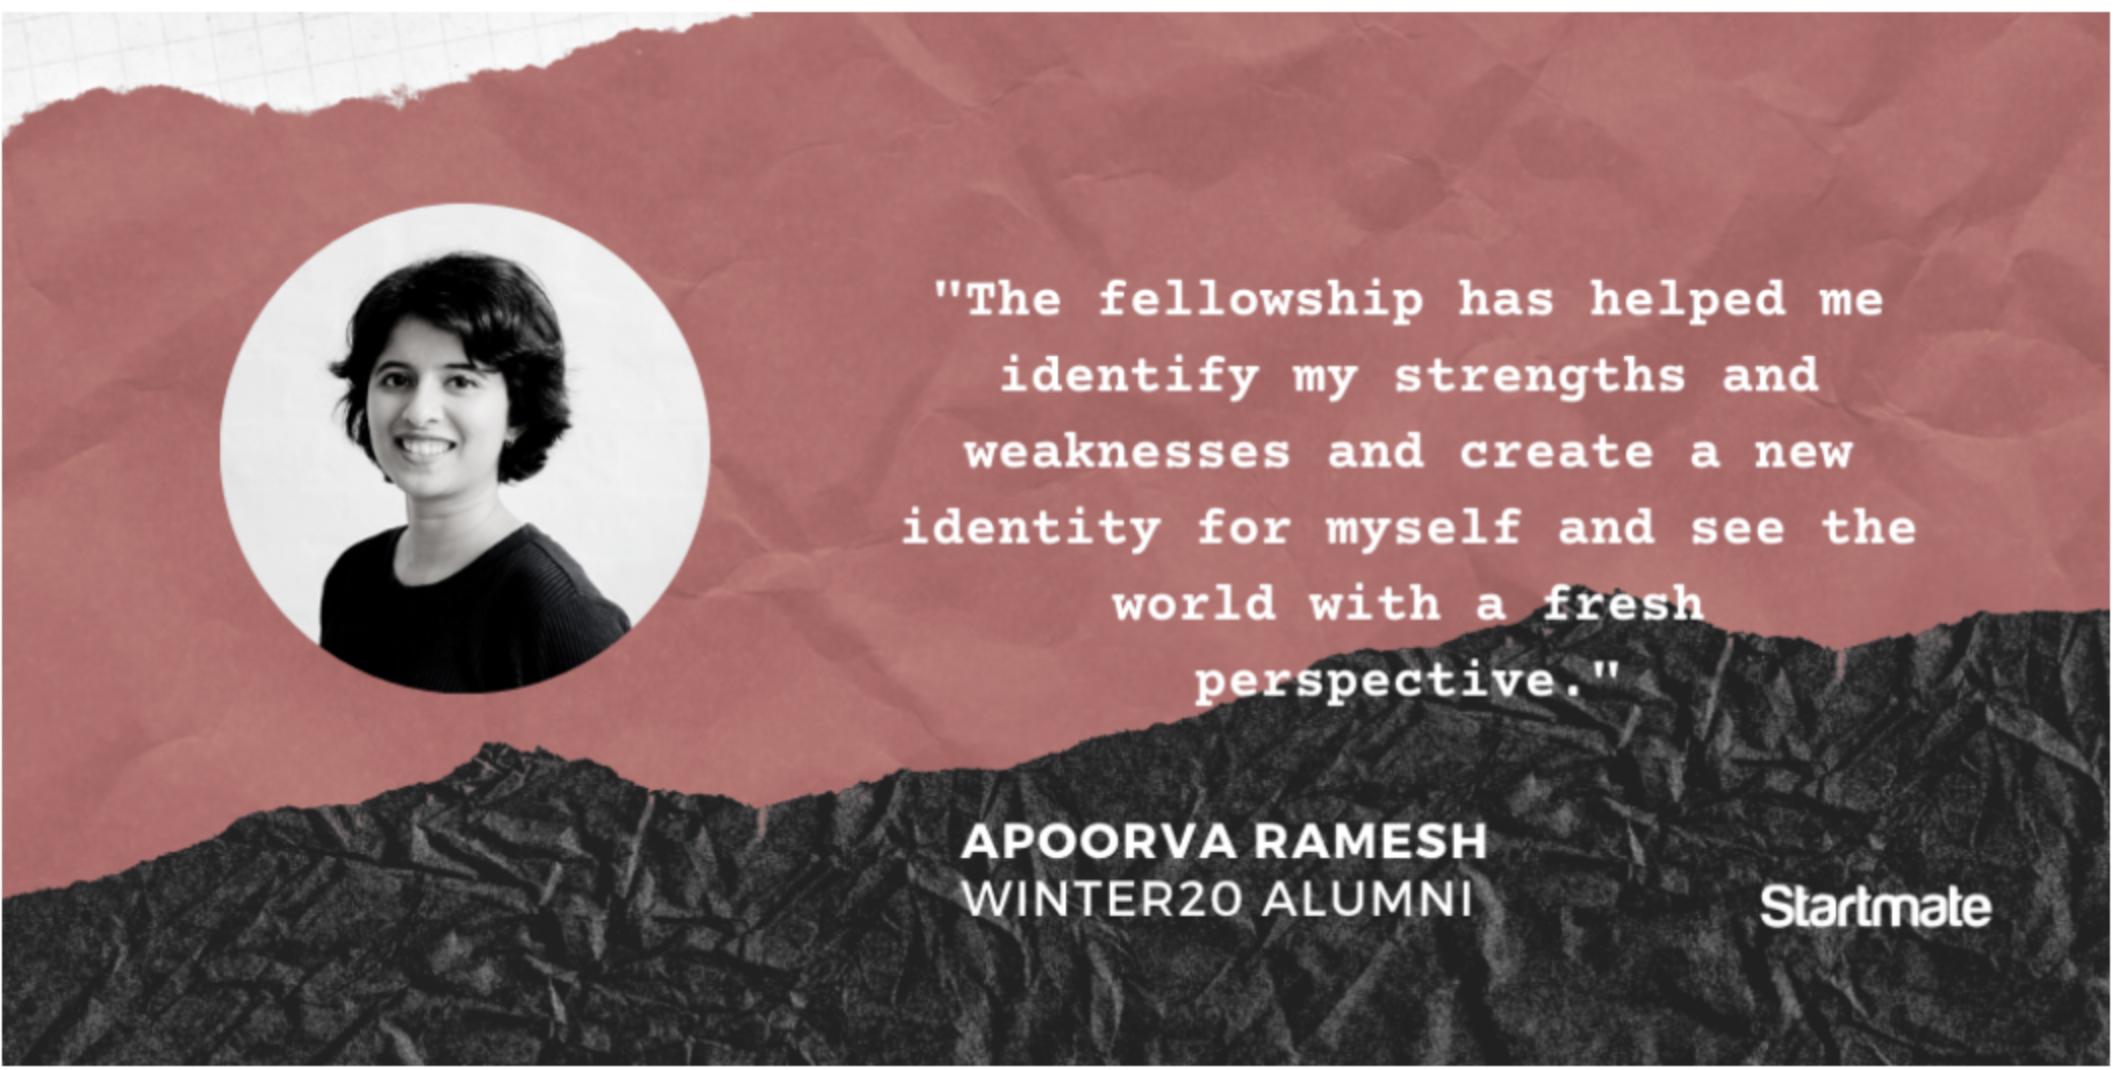 Apoorva Ramesh, Winter20 Fellow